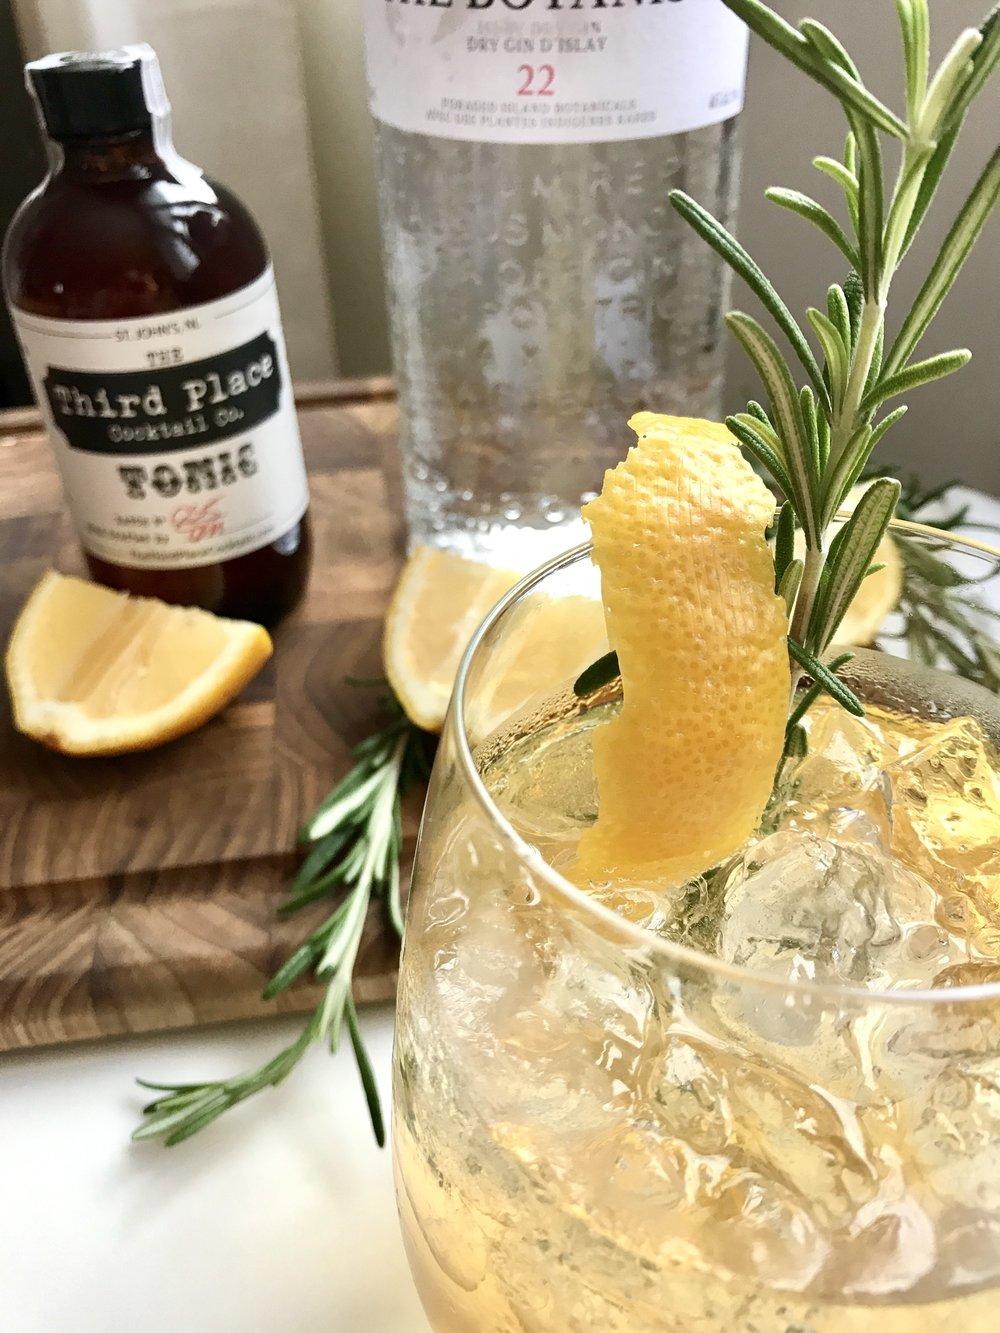 Third place tonic cocktail company st. john's newfoundland christmas holiday recipe lemon rosemary gin